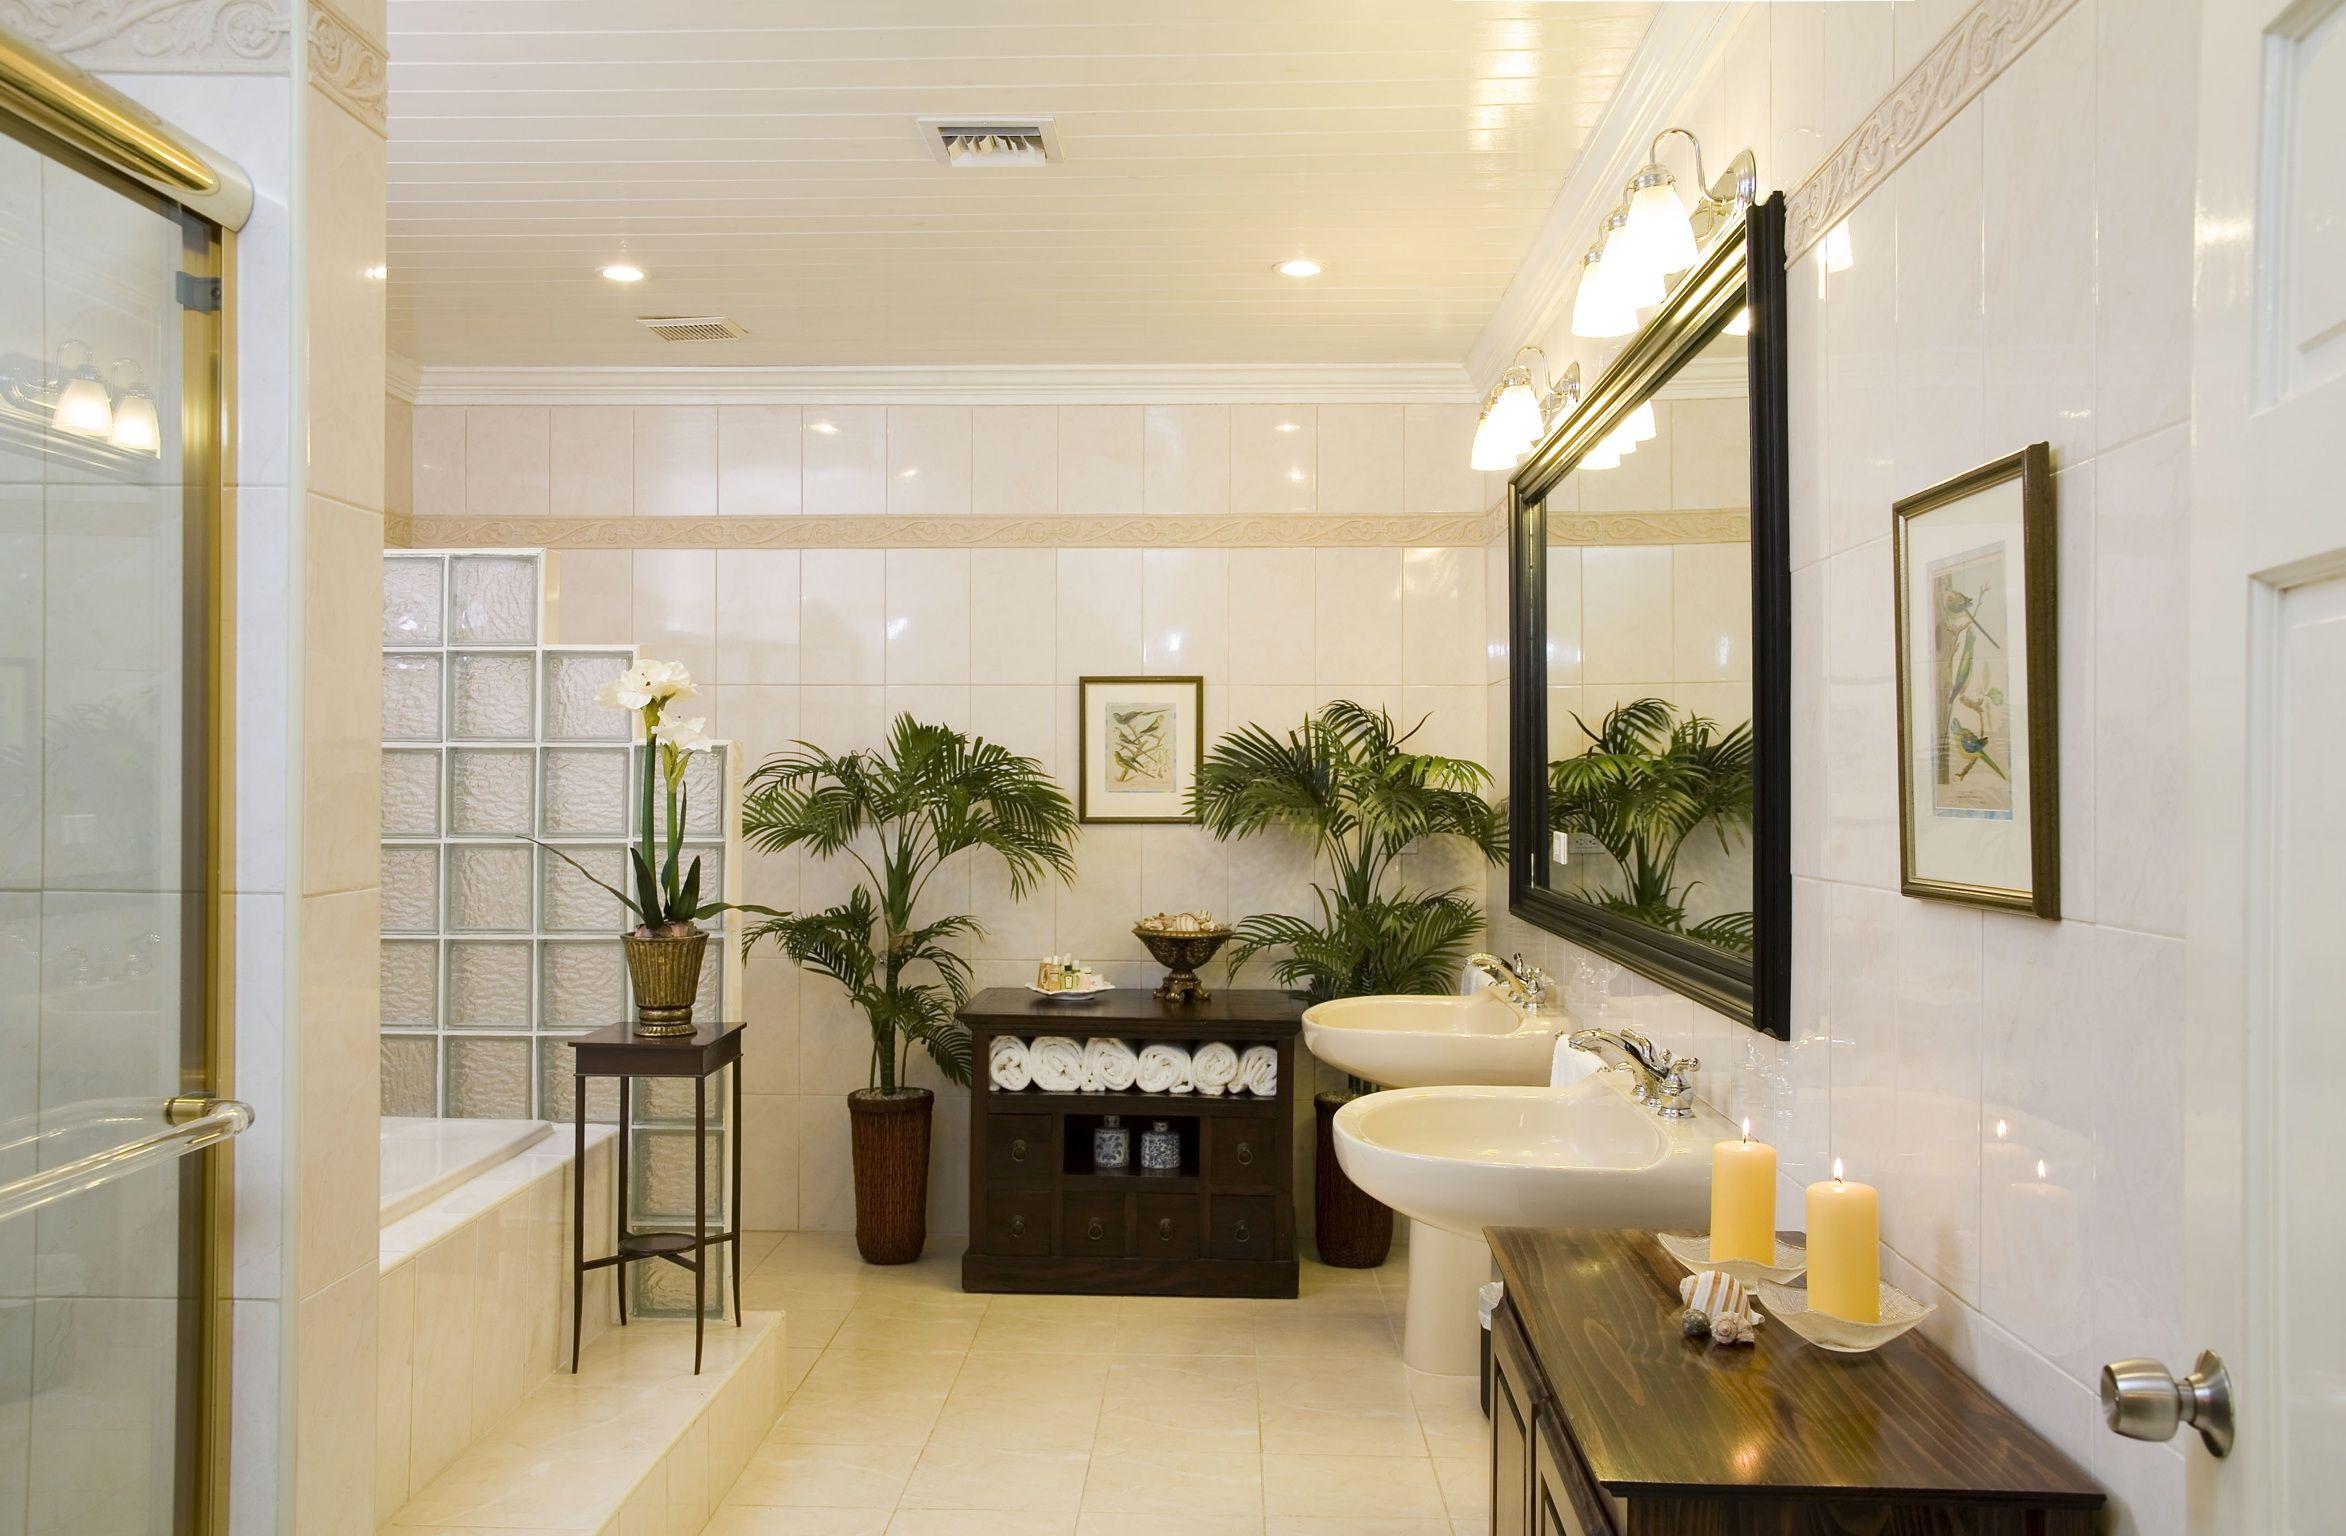 Decadent Bathrooms In The Suites With Bulgari Bath Amenities British Colonial Bathroom British Interior Design Tropical House British colonial bathroom decor